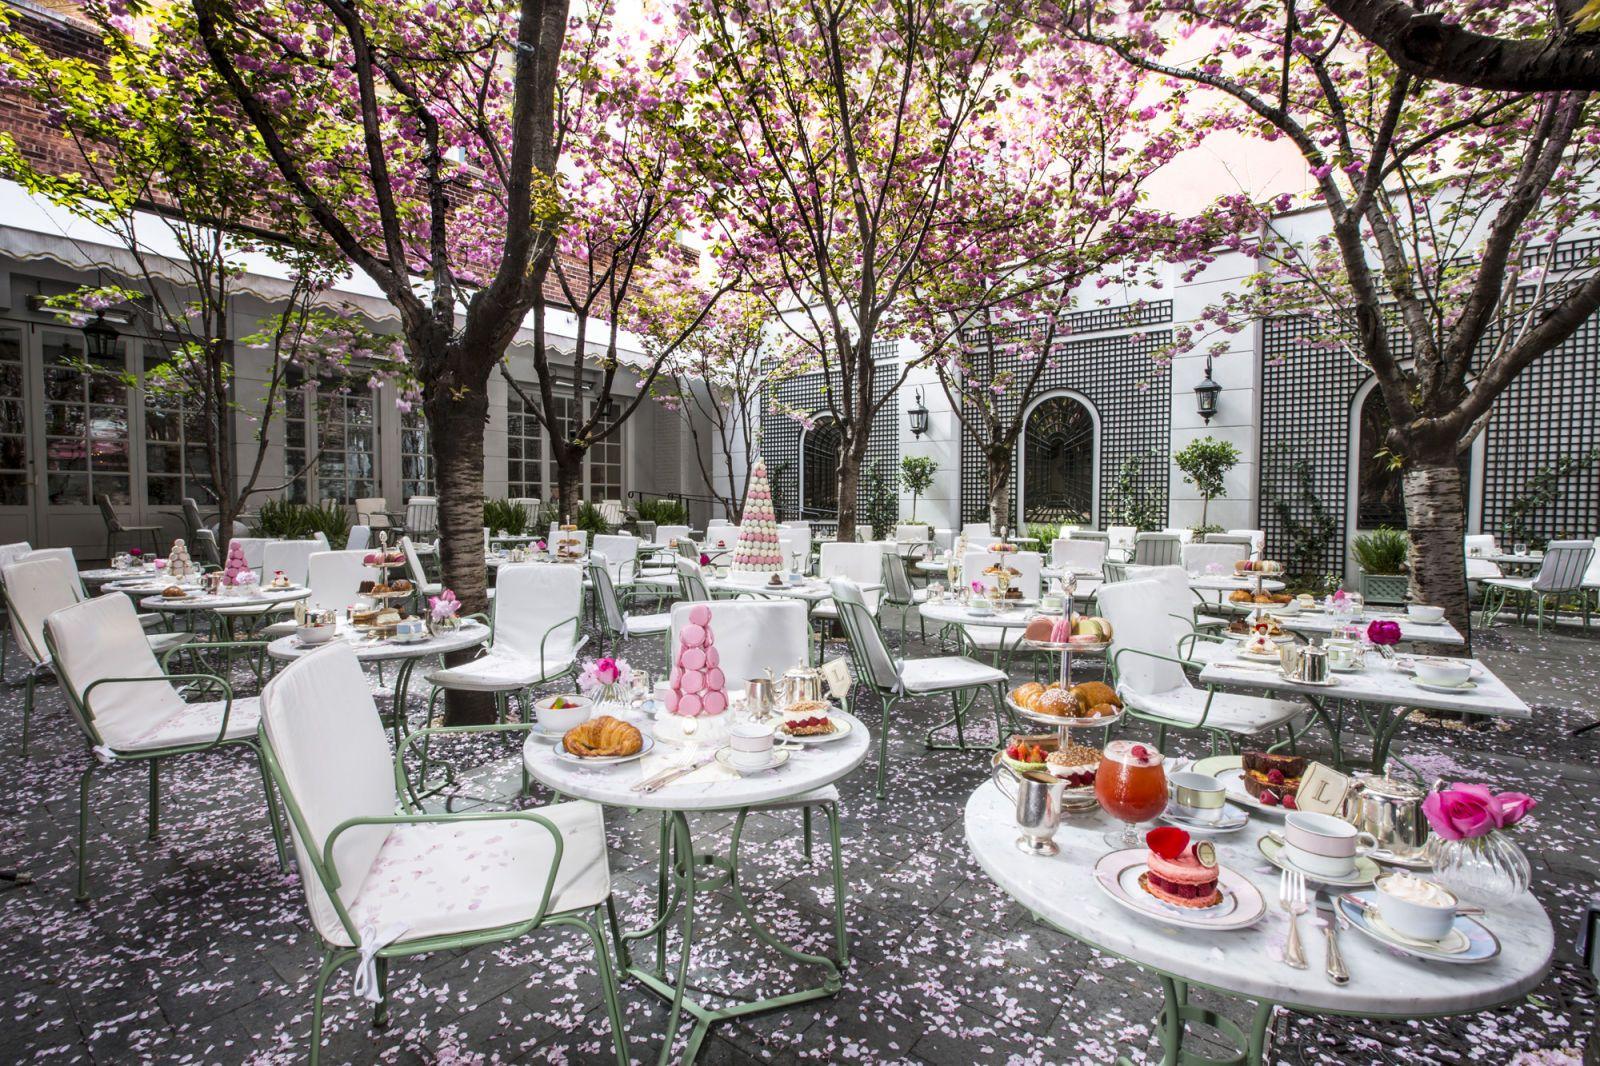 wedding reception locations nyc%0A   Chic Restaurants For Garden Dining  The Worlds Chicest Garden Dining  Restaurants